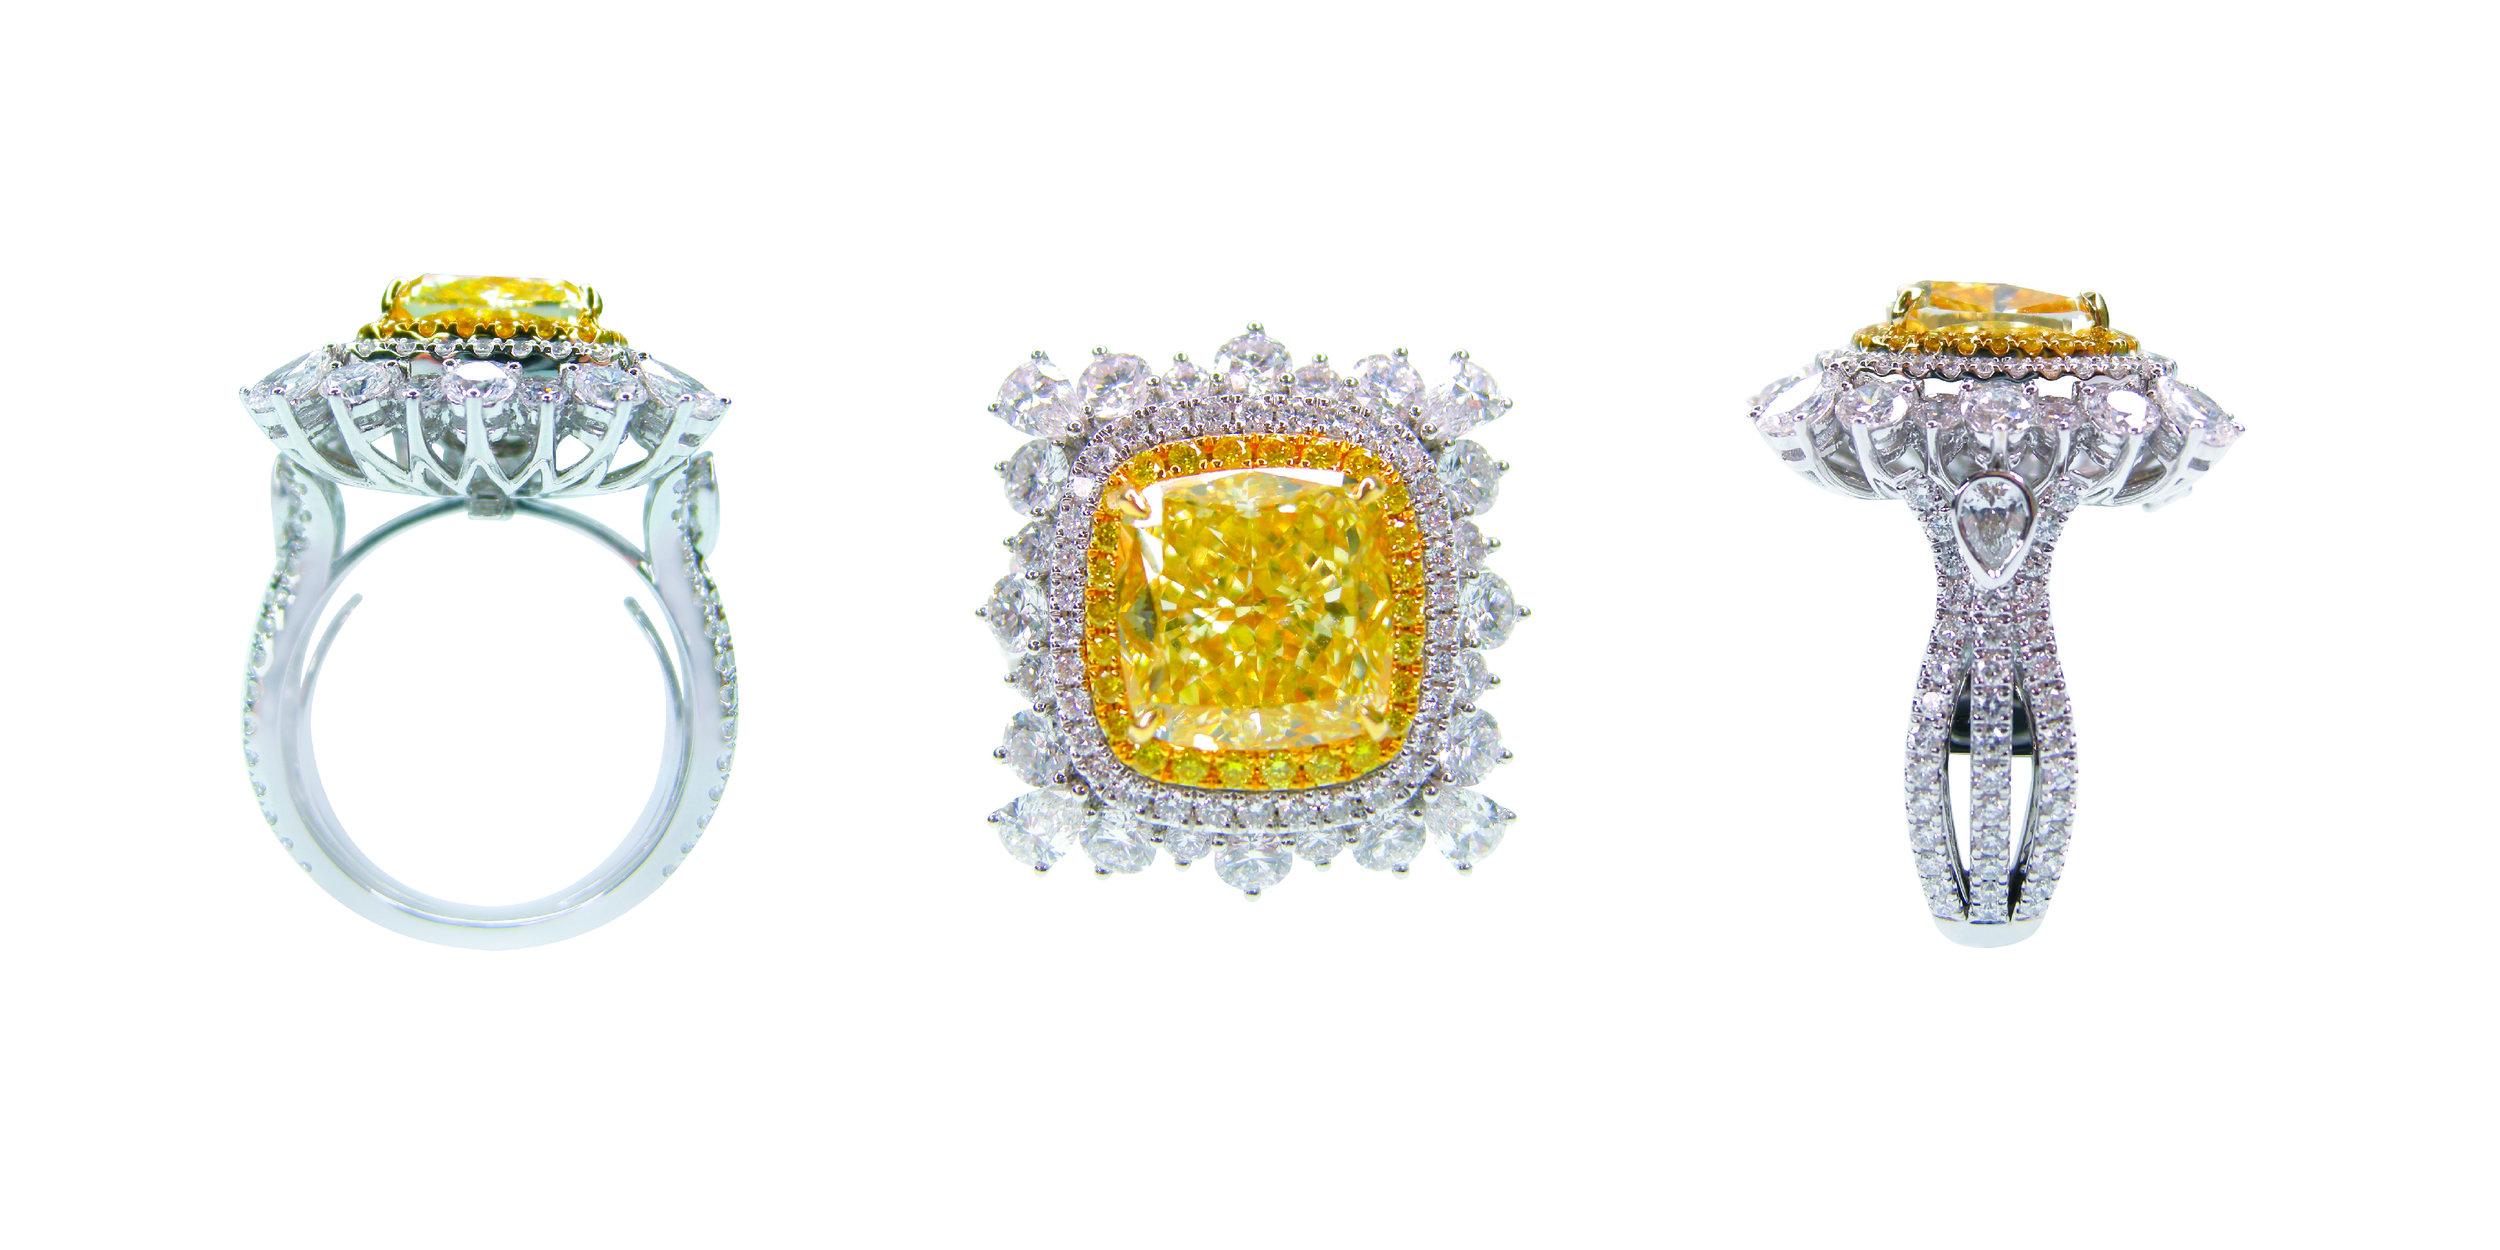 5 CARAT FANCY YELLOW DIAMOND RING AND PENDANT BESPOKE FINE JEWELLERY BY SHAHINA HATTA HONG KONG